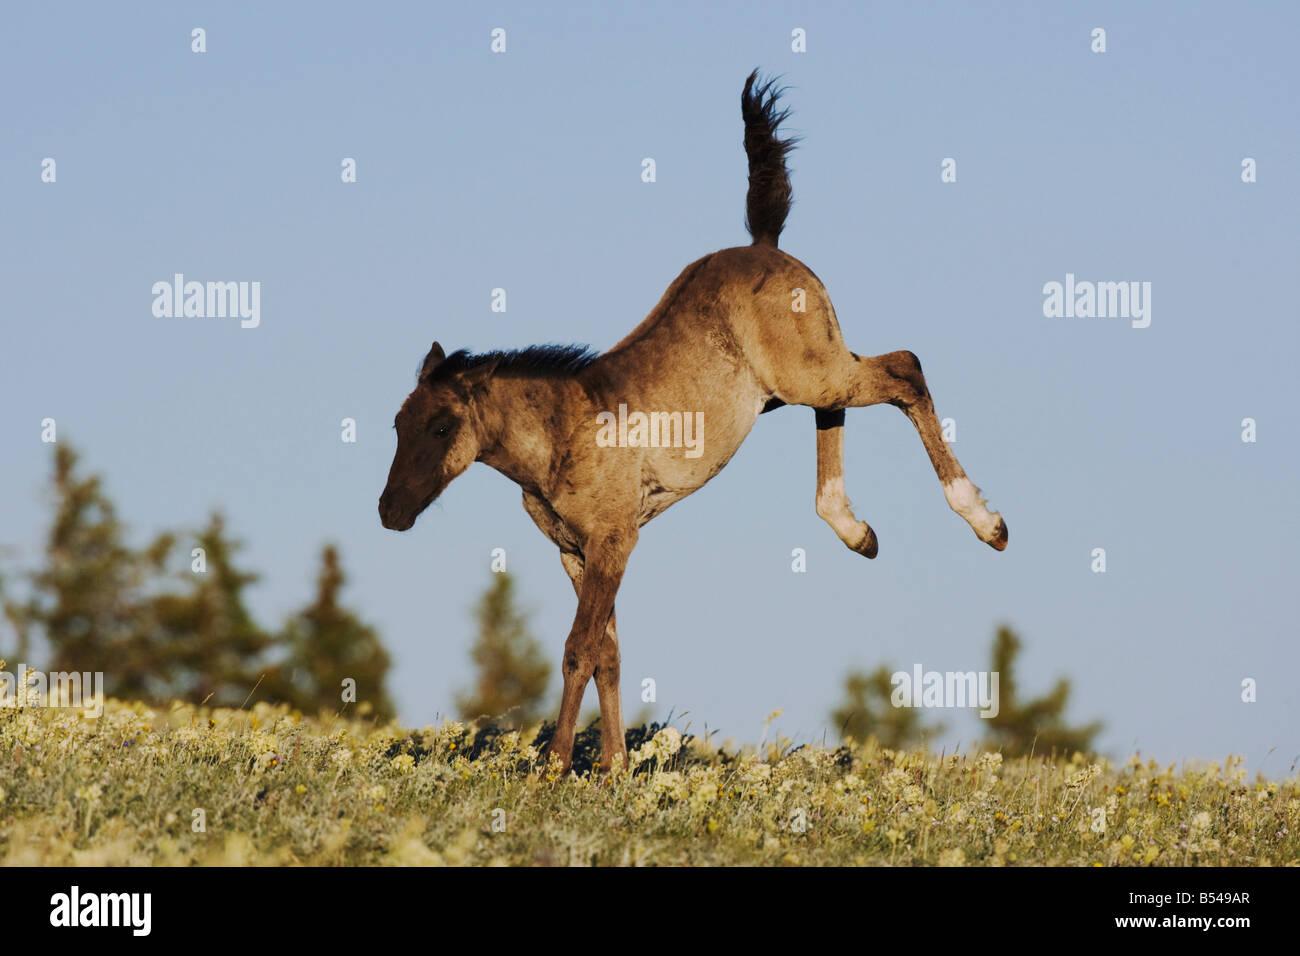 Mustang Horse Equus Caballus Colt Jumping Pryor Mountain Wild Horse Stock Photo Alamy